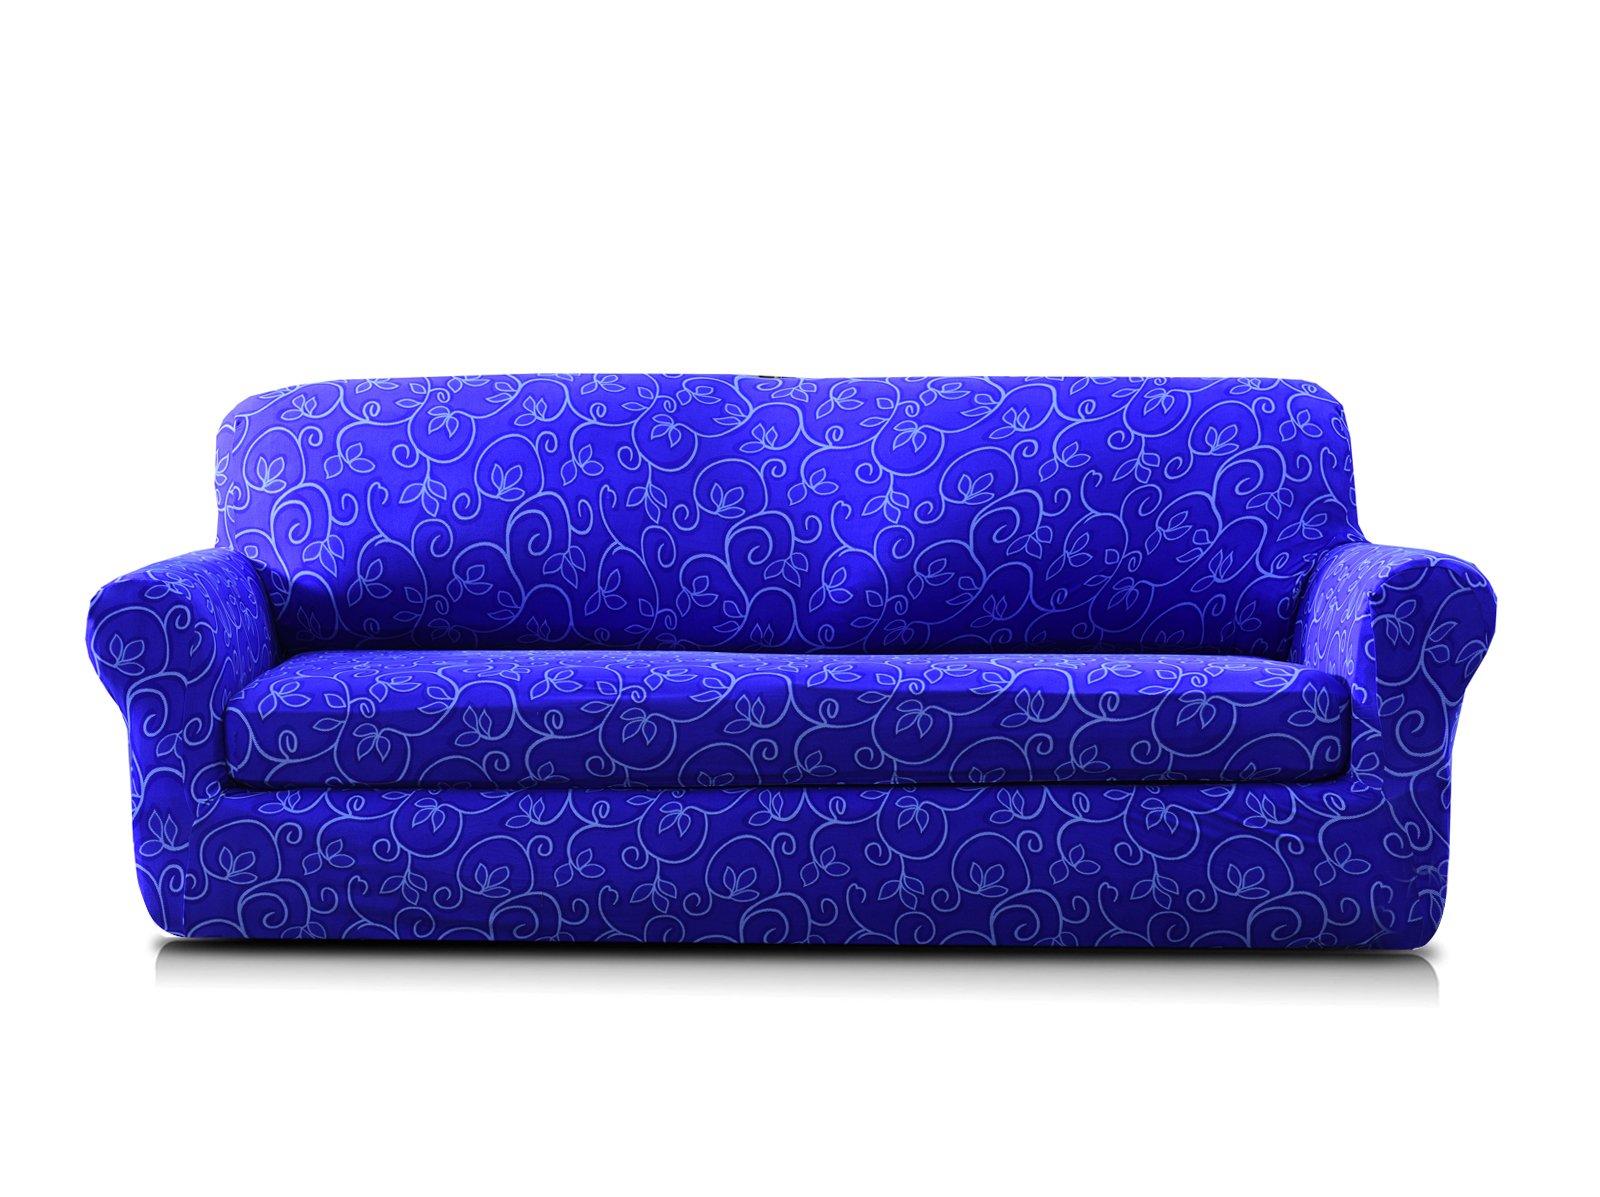 TIKAMI 2-Piece Spandex Printed Fit Stretch Sofa Slipcovers (Loveseat, Blue Flower)